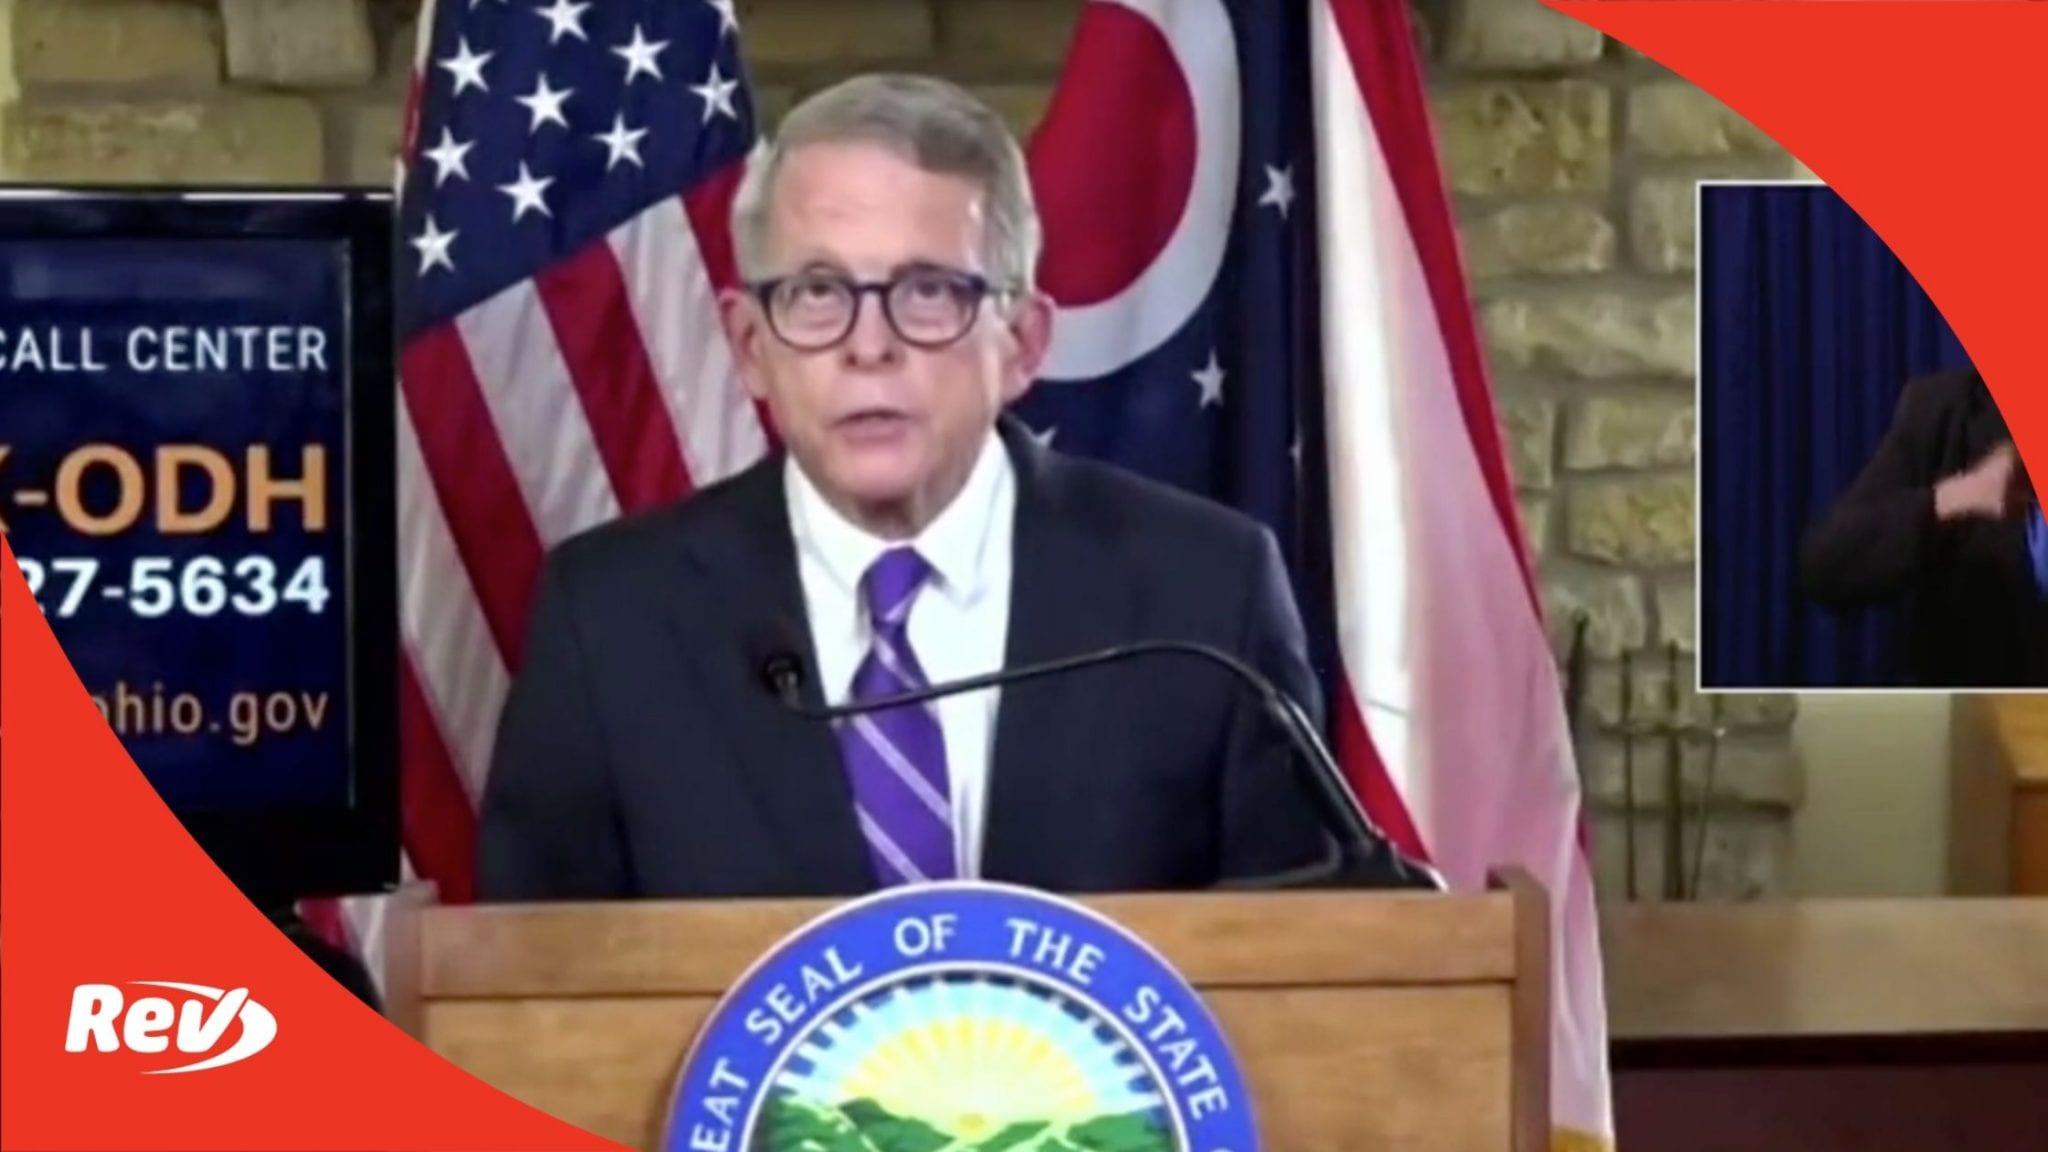 Ohio Gov. Mike DeWine Coronavirus Press Conference Transcript October 22